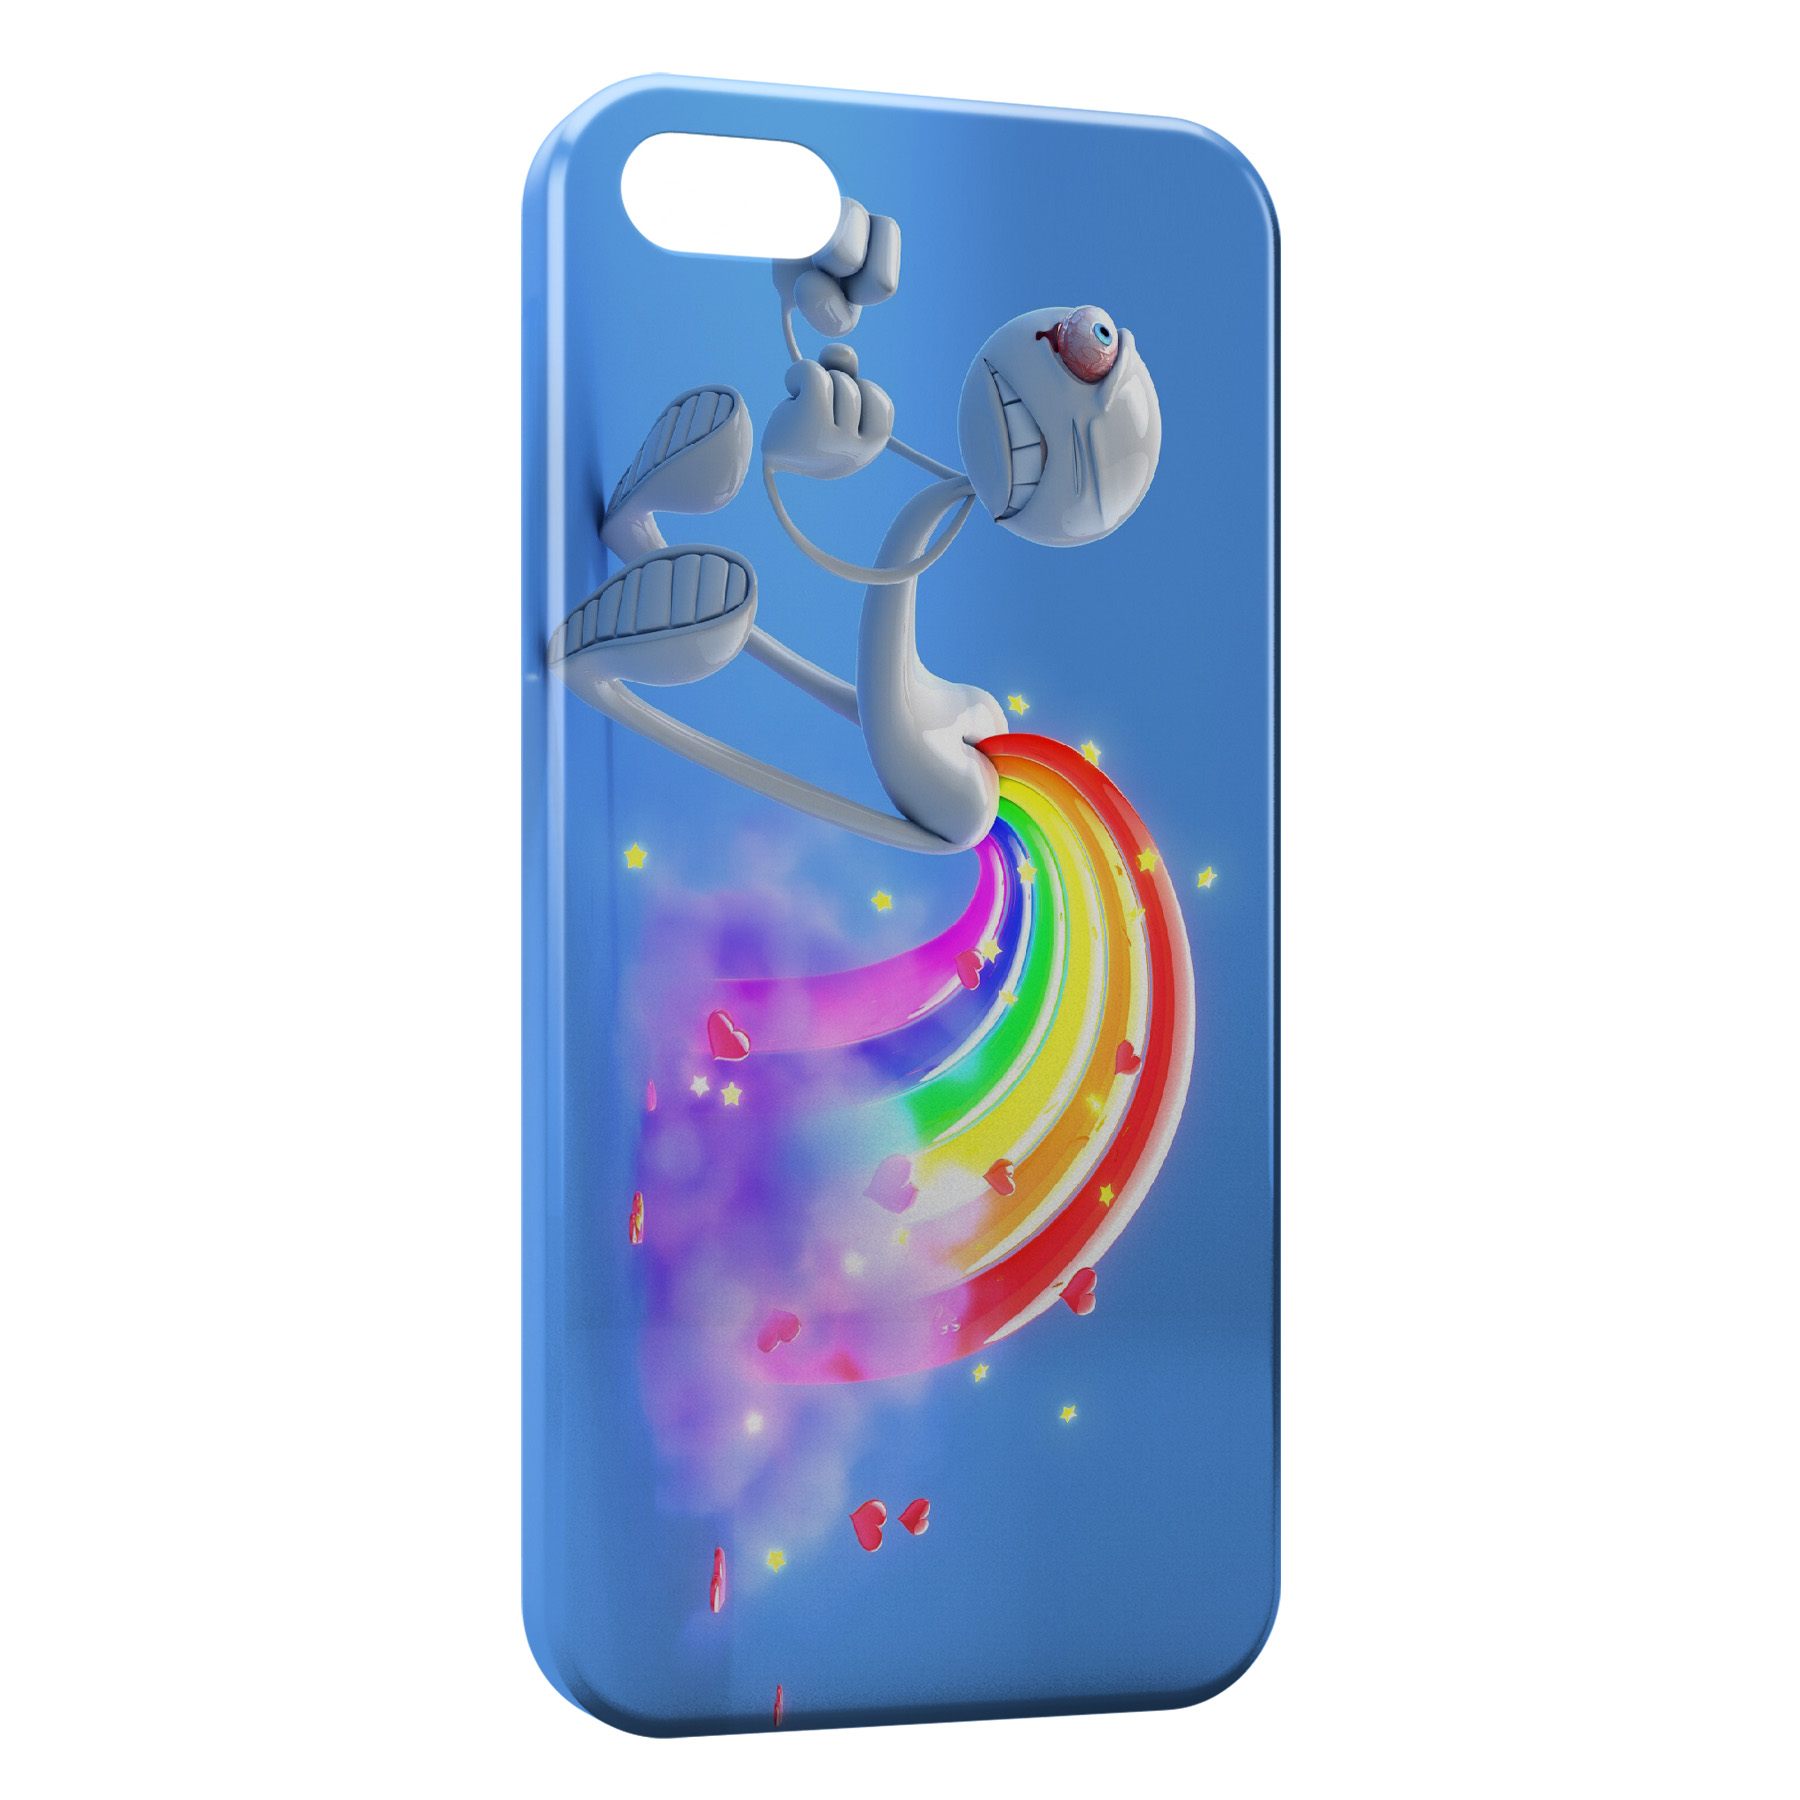 coque iphone 6 fun